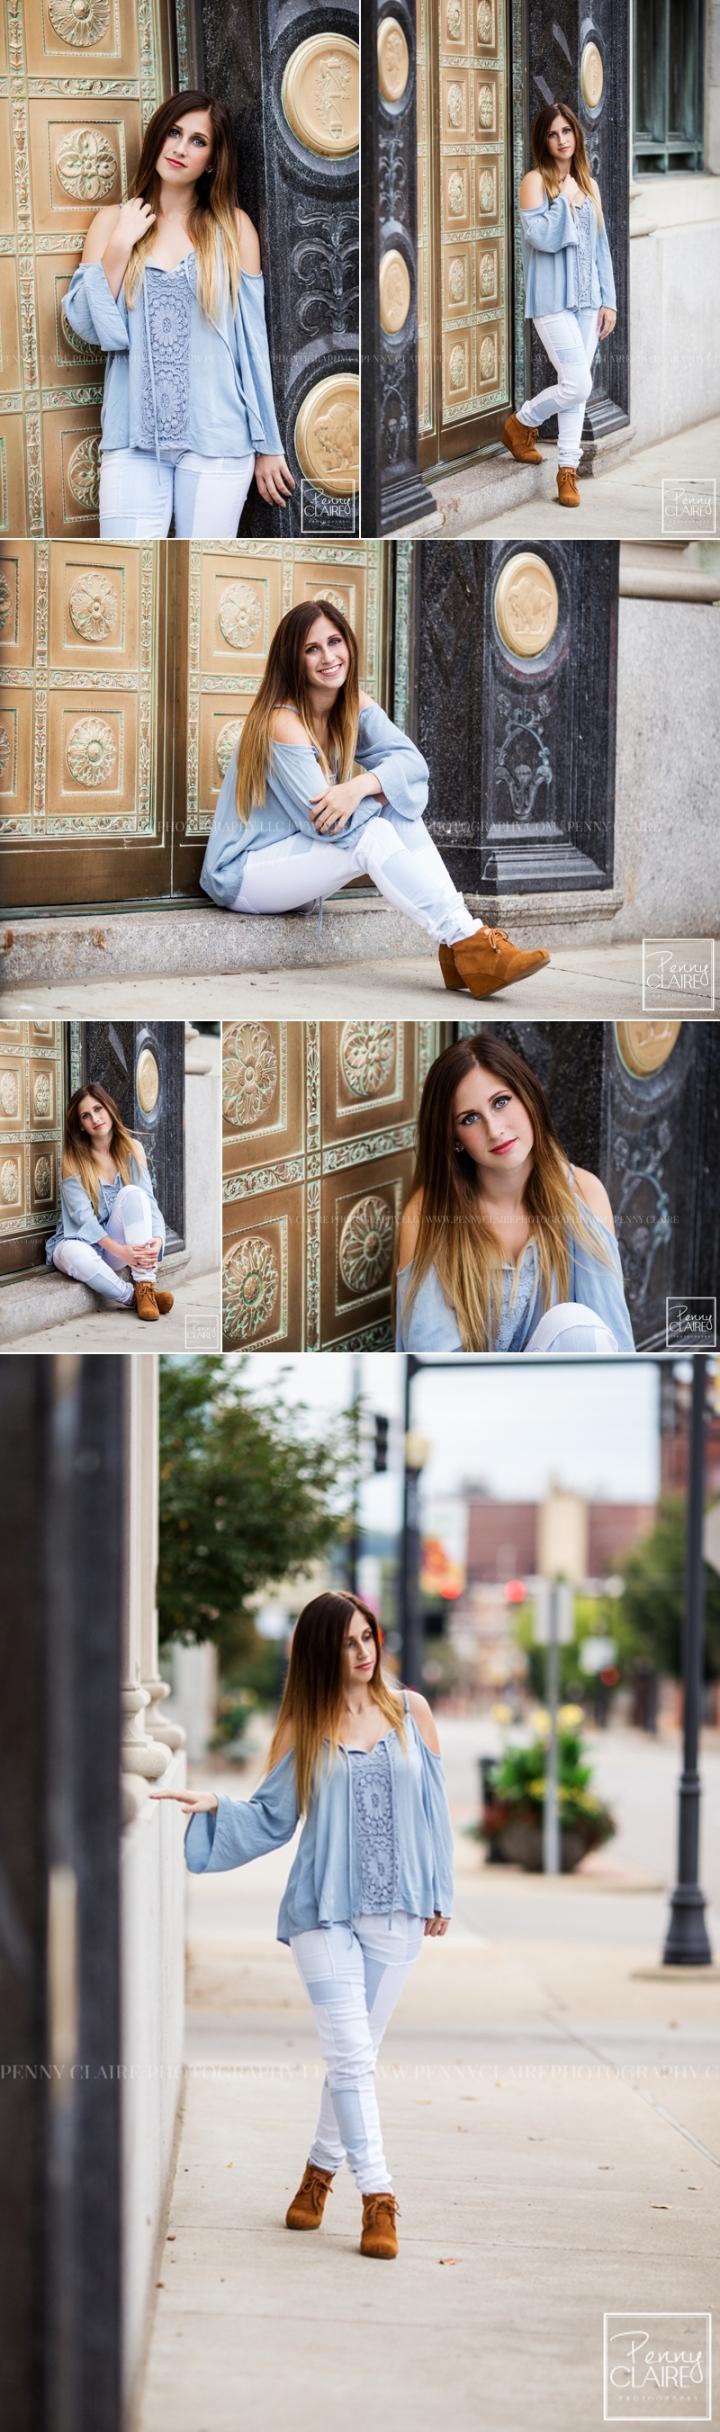 High-School-Senior-Photos-pennyclaire 5